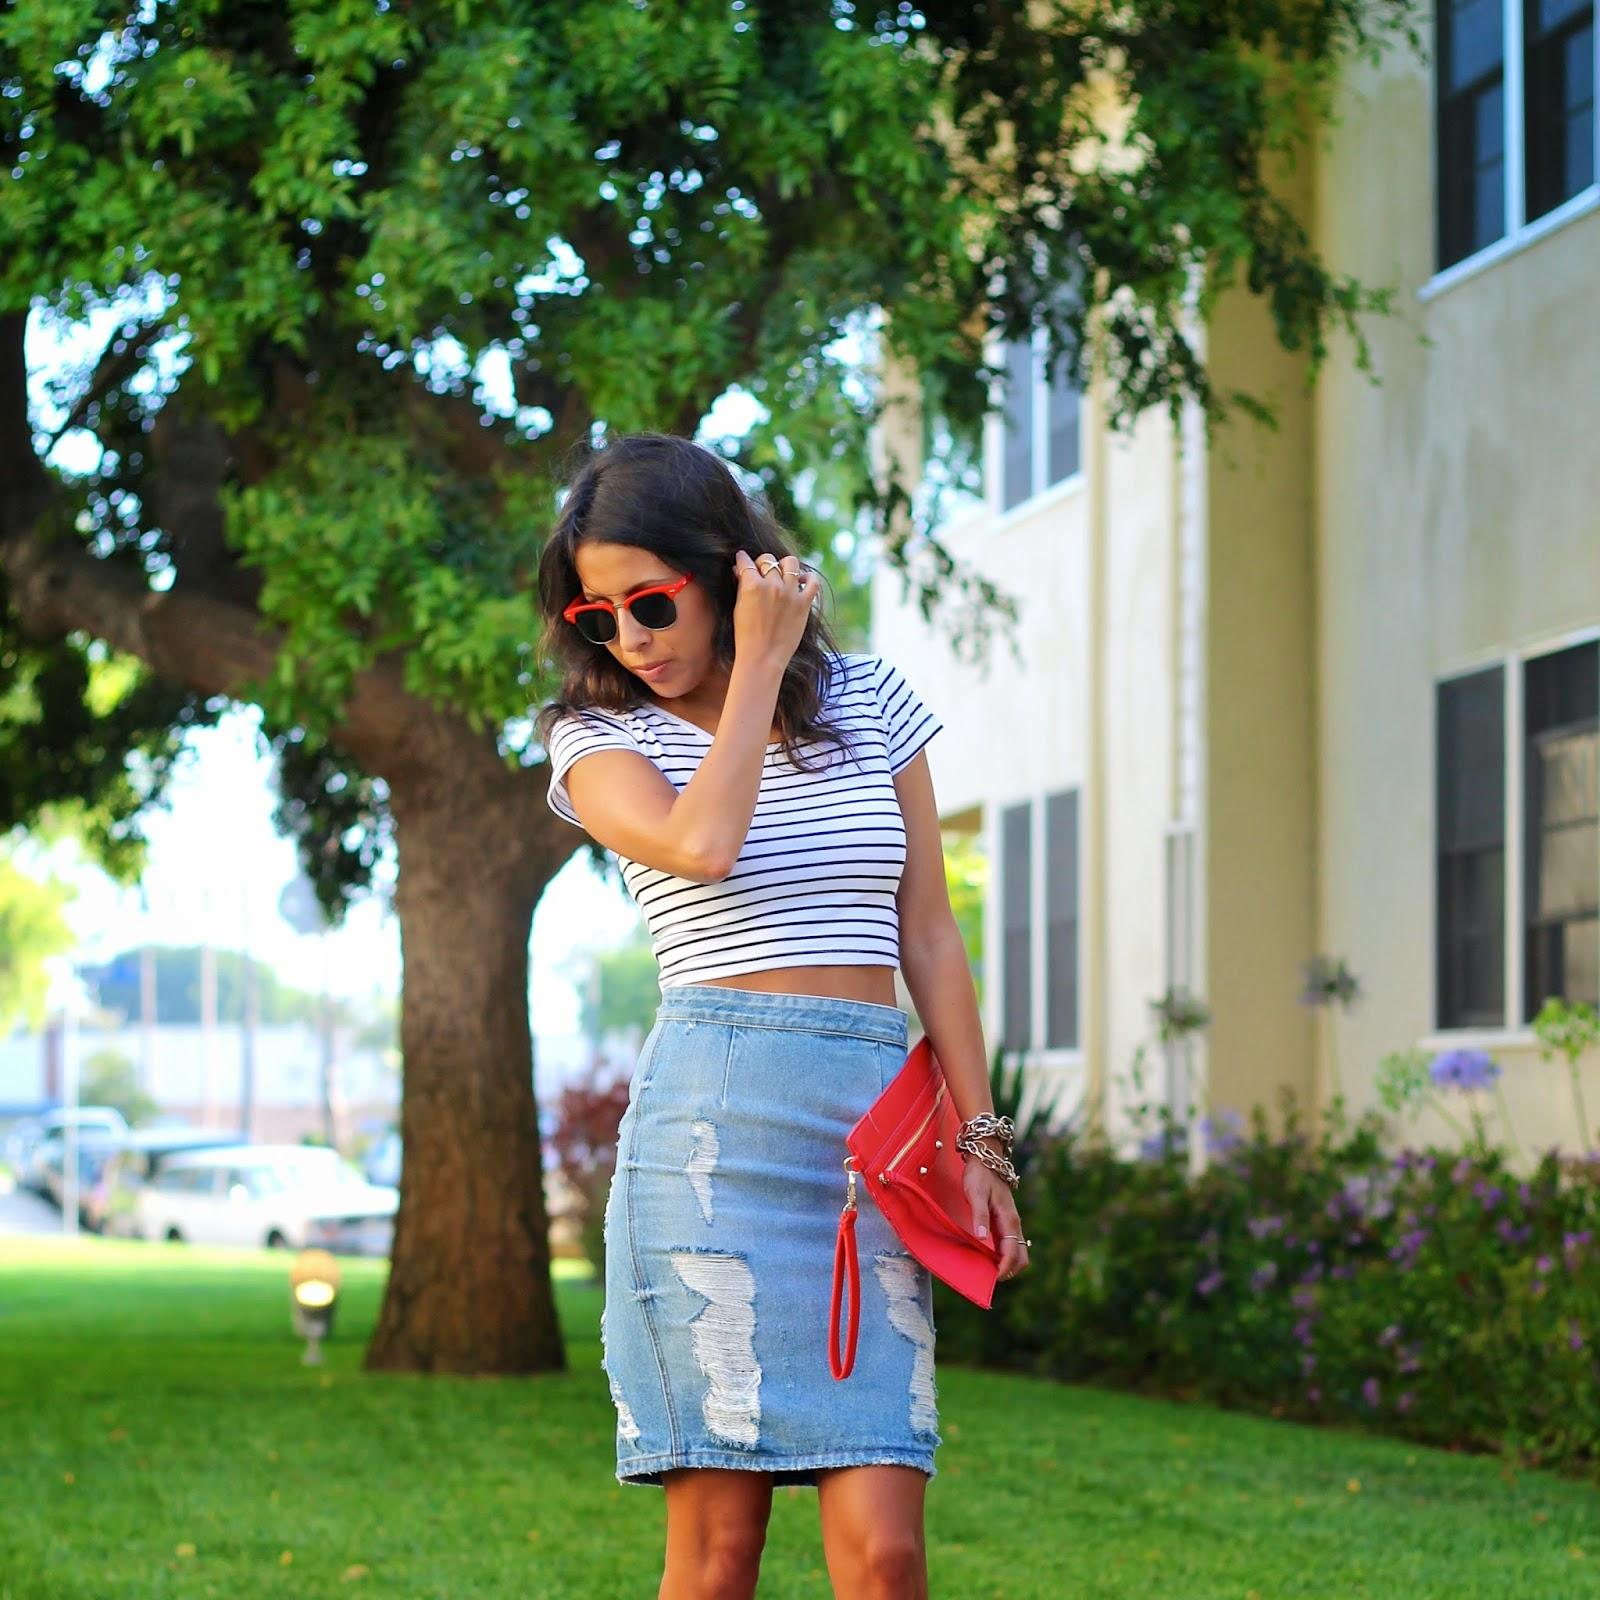 denim skirt outfit, crop top, zara, target style